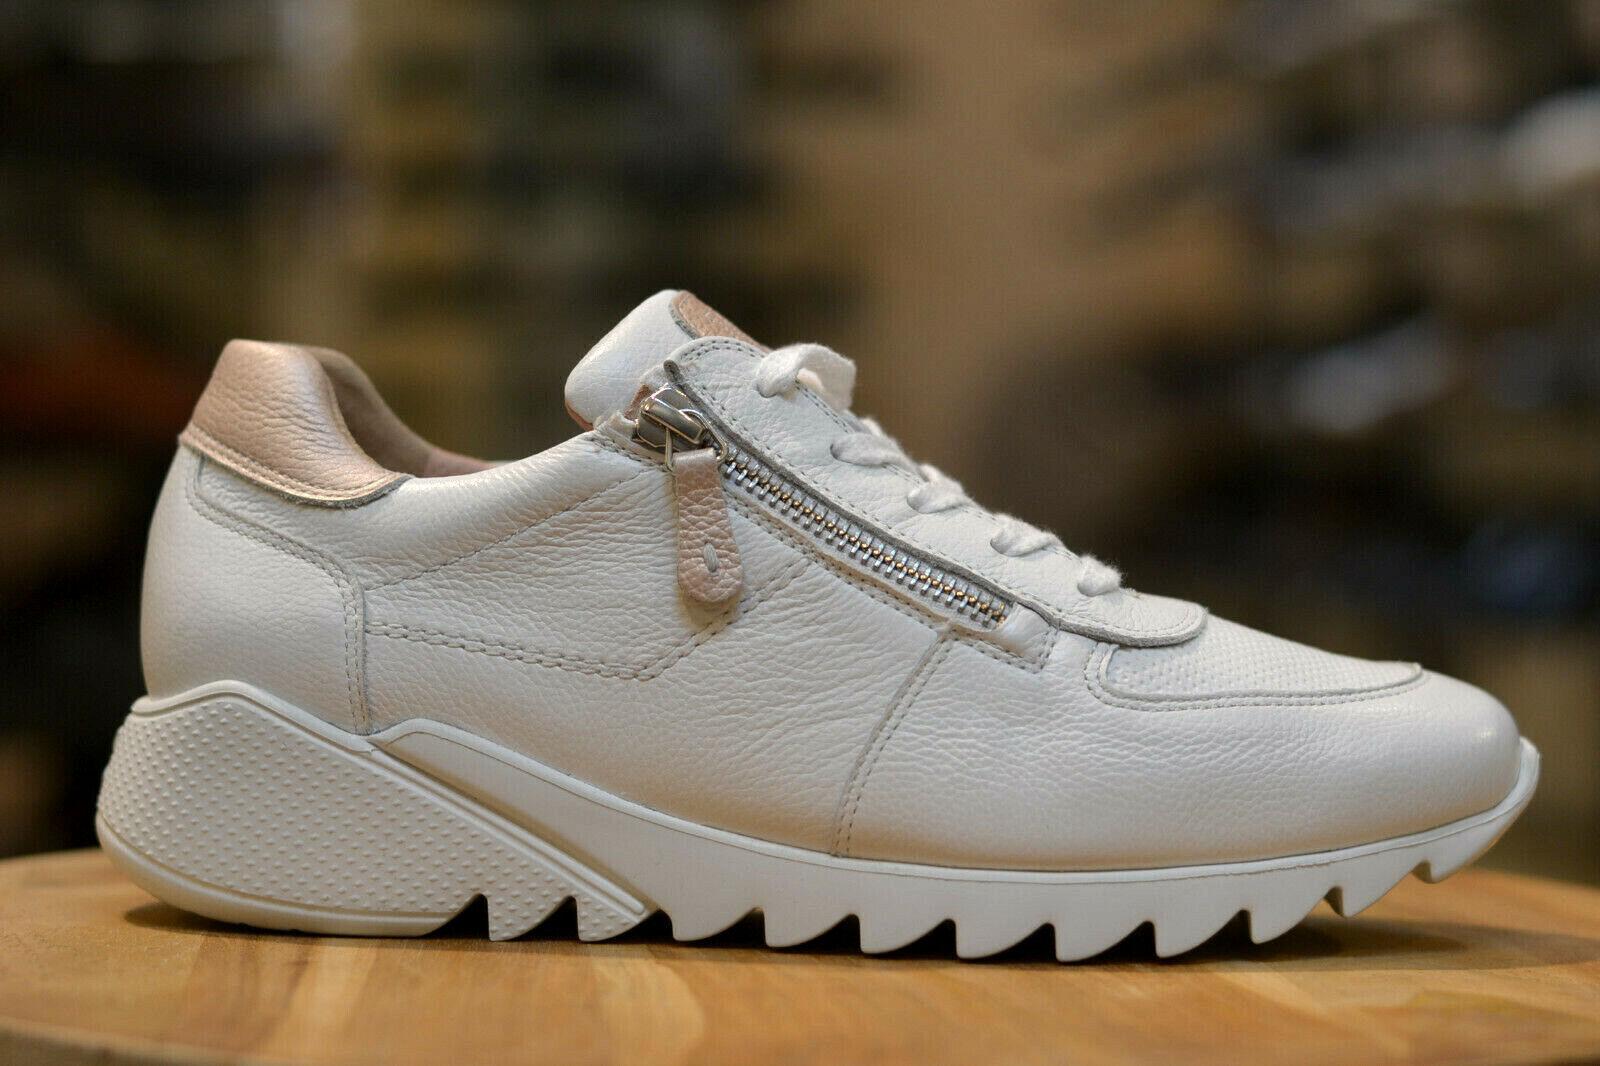 NEU Paul Grün Damen edel Turnschuhe Schnürschuhe Schuhe Rosa